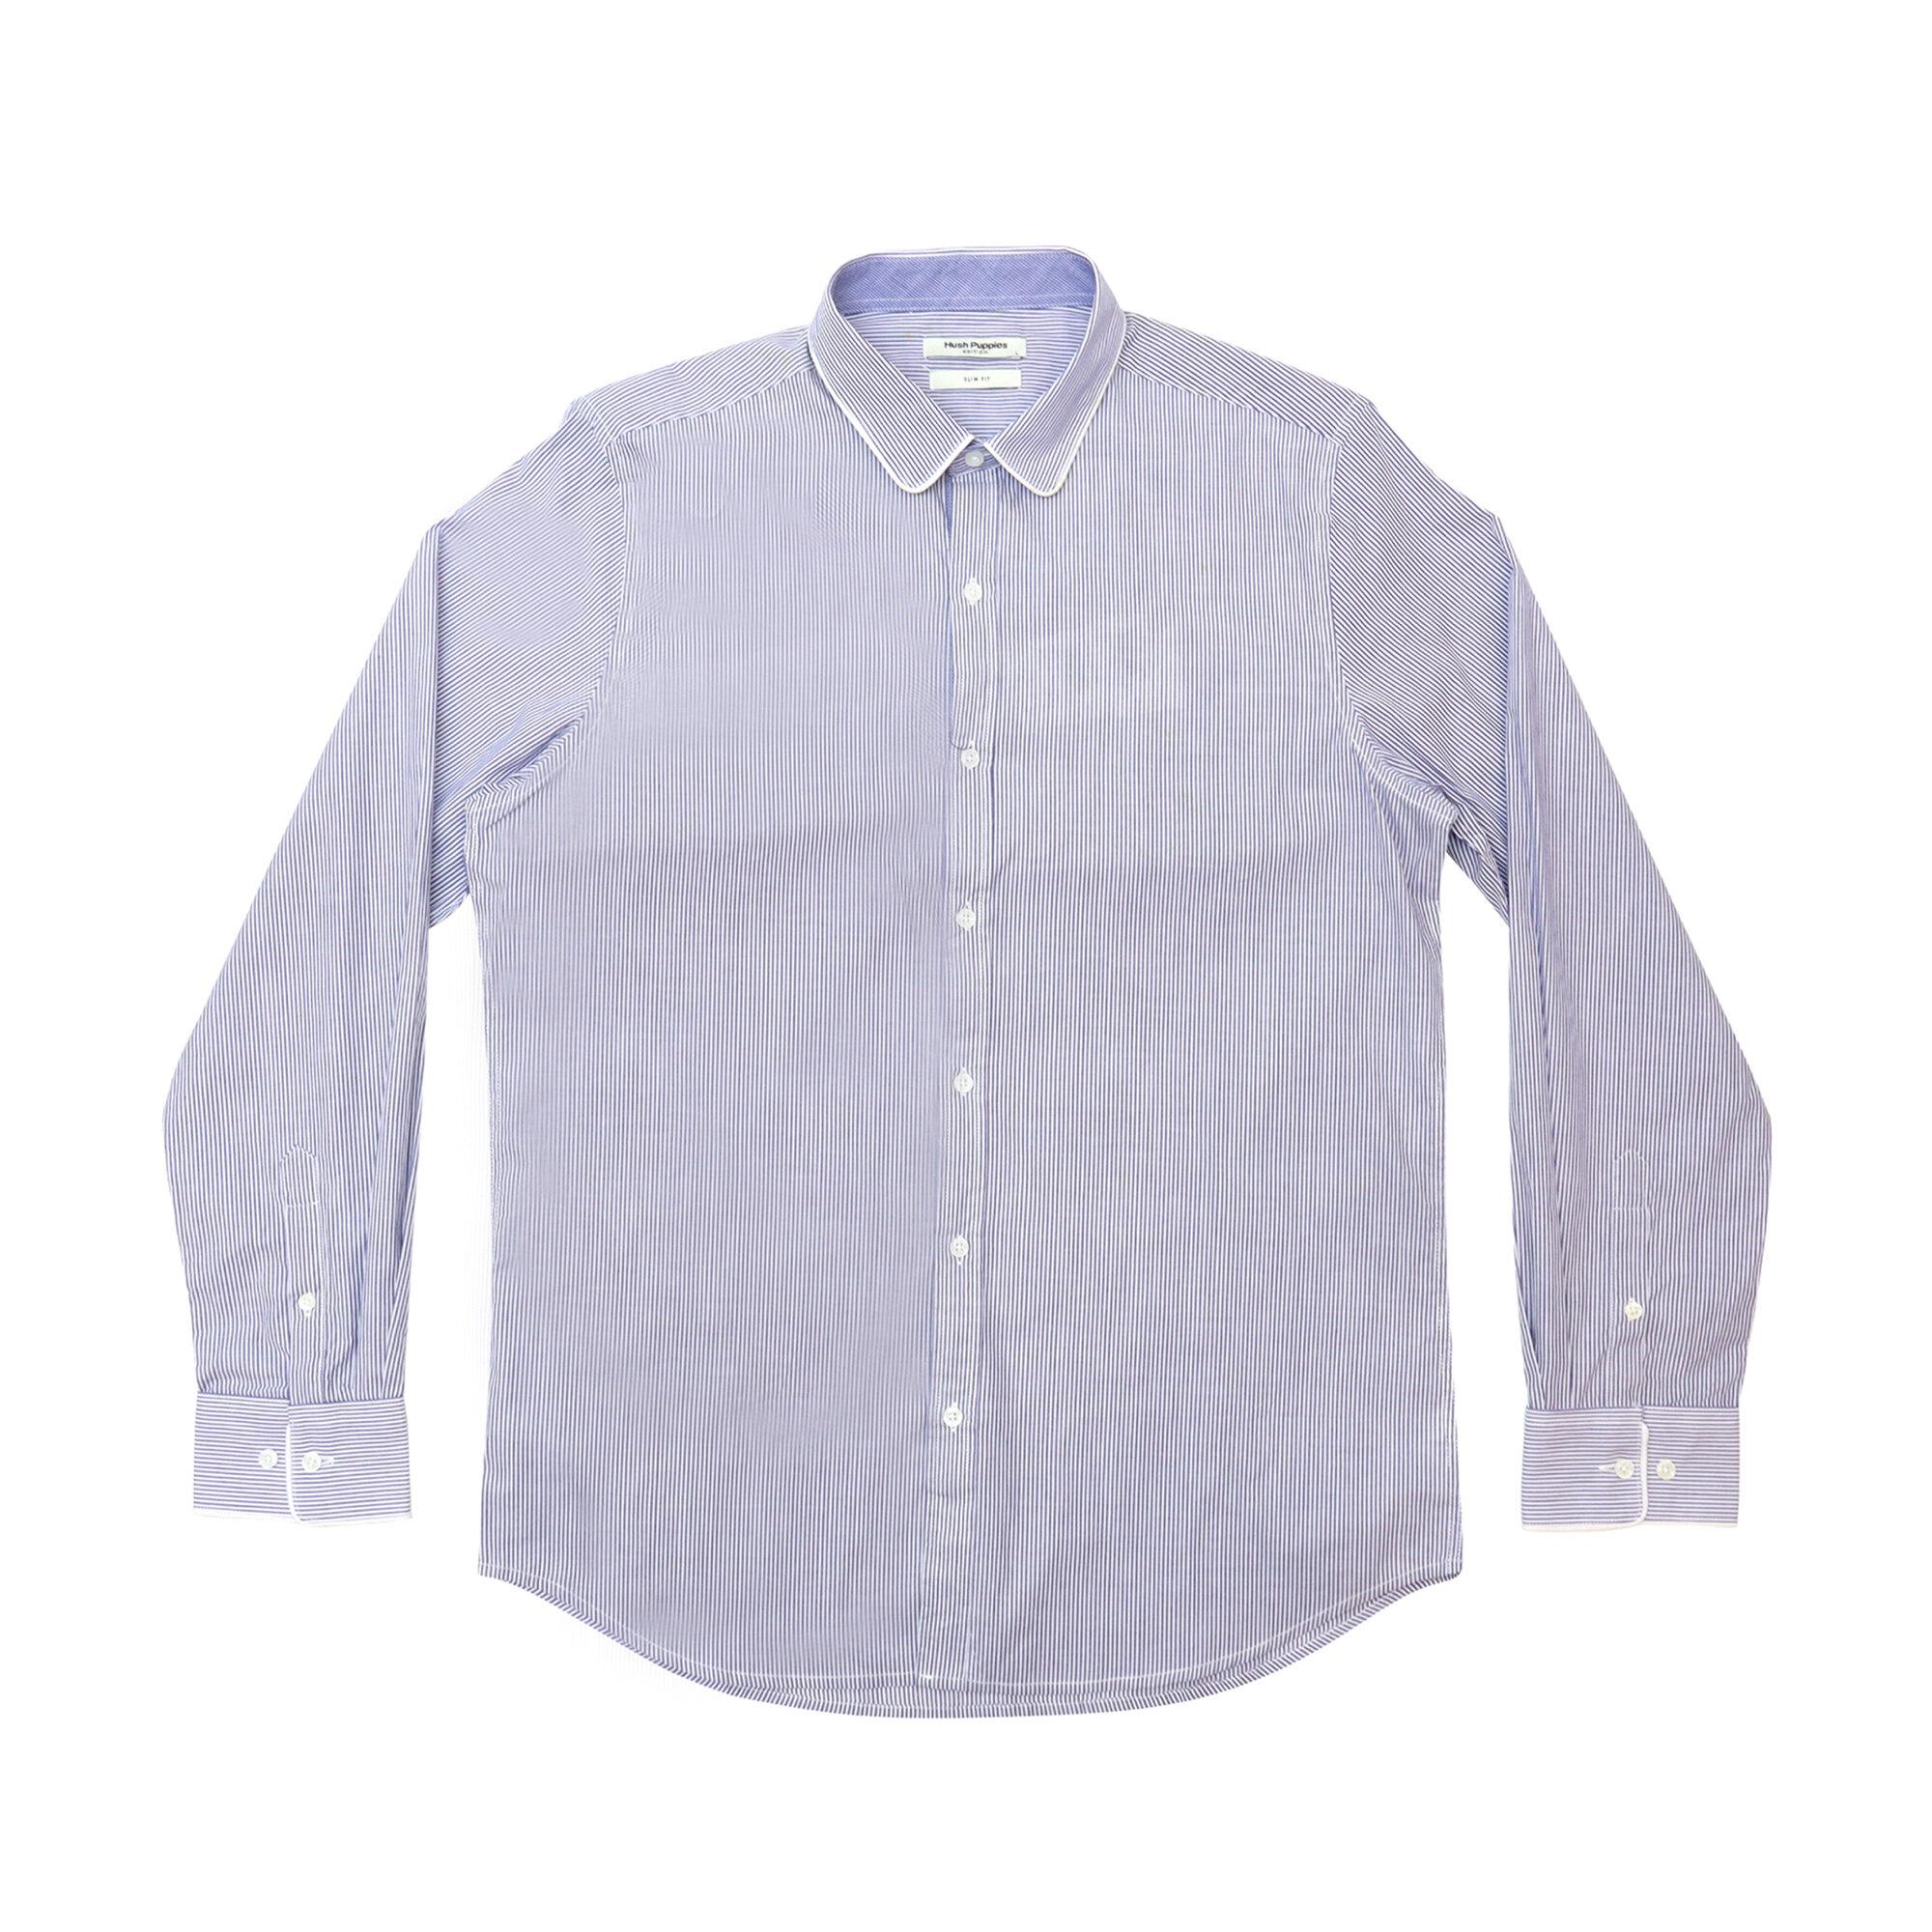 Hush Puppies Godfrey Men Long Sleeve Shirt  HPW617691